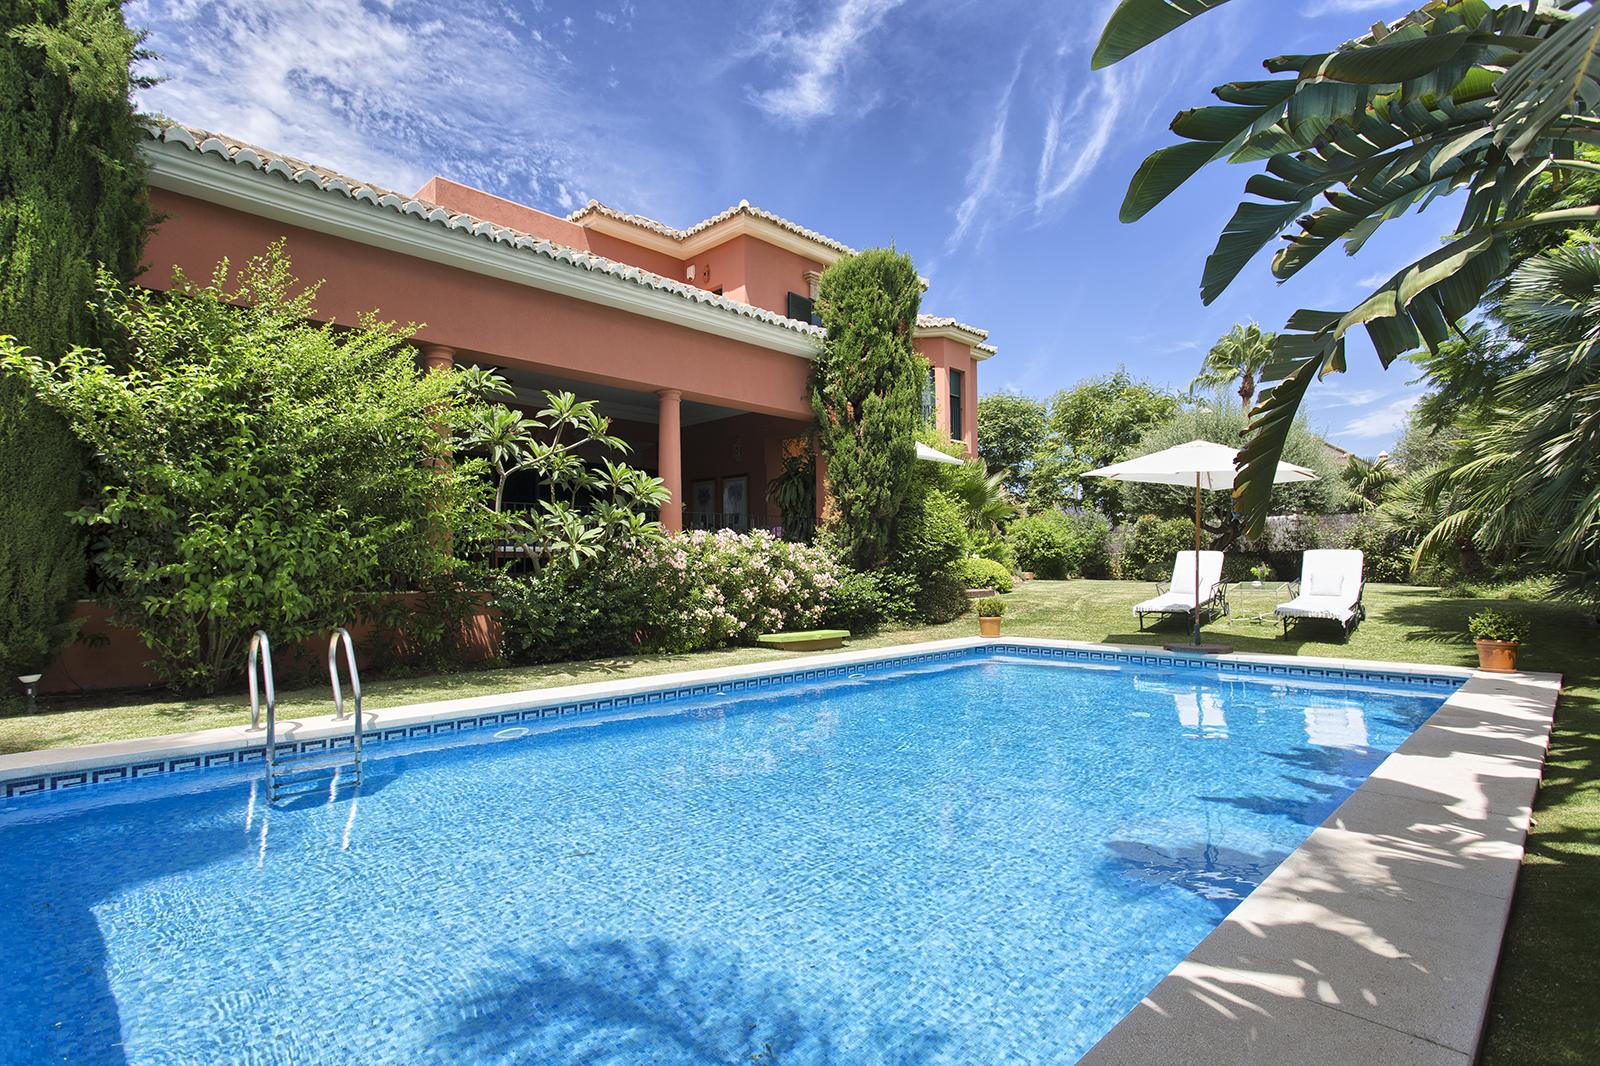 Impressive villa in the best location on Marbella's Golden Mile